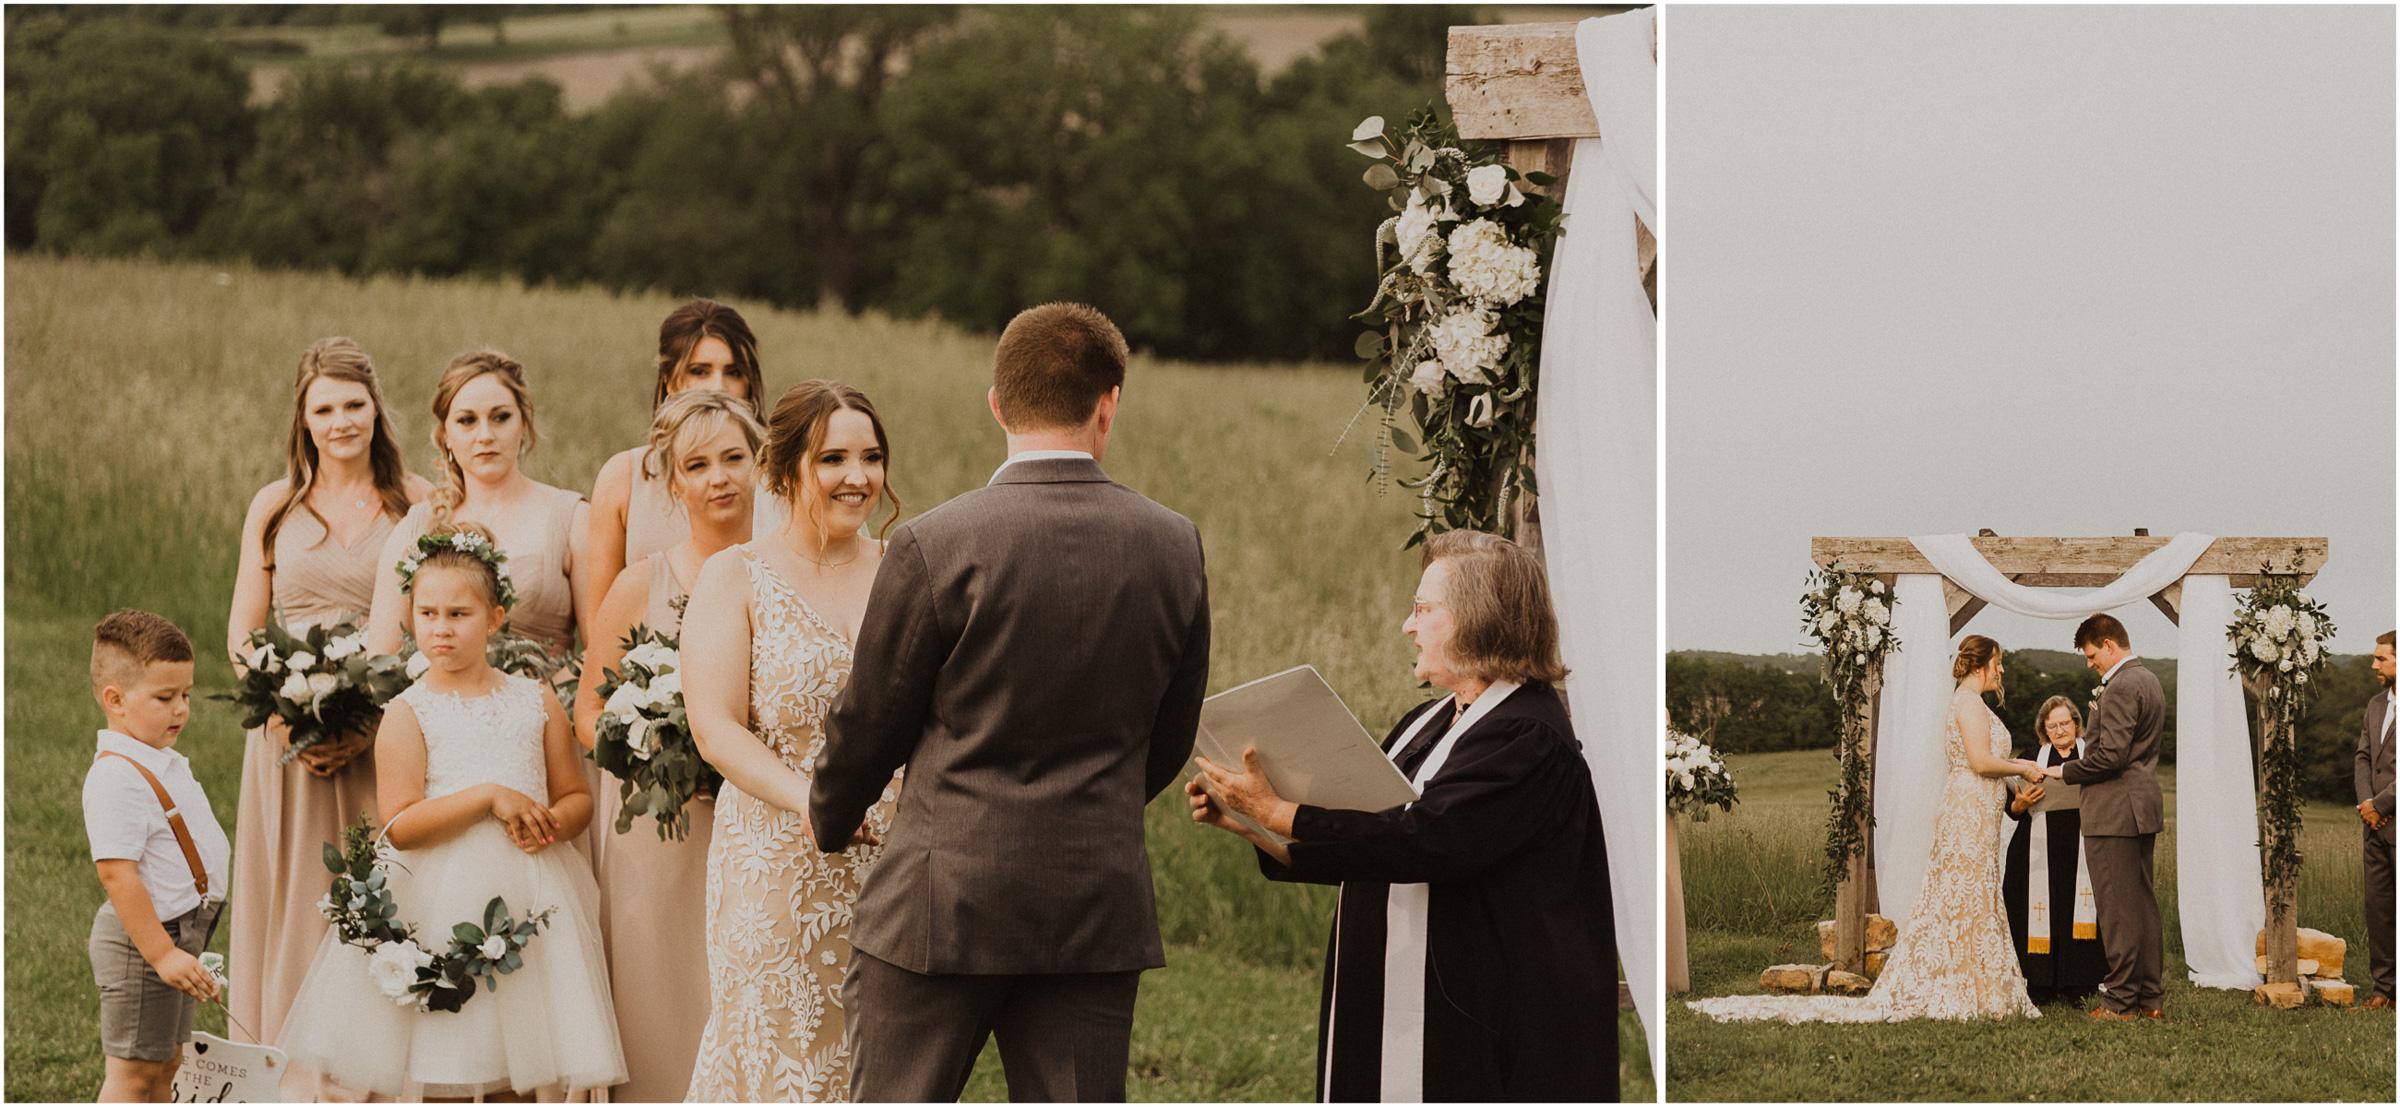 alyssa barletter photography weston red barn farm timberbarn summer outdoor wedding-44.jpg